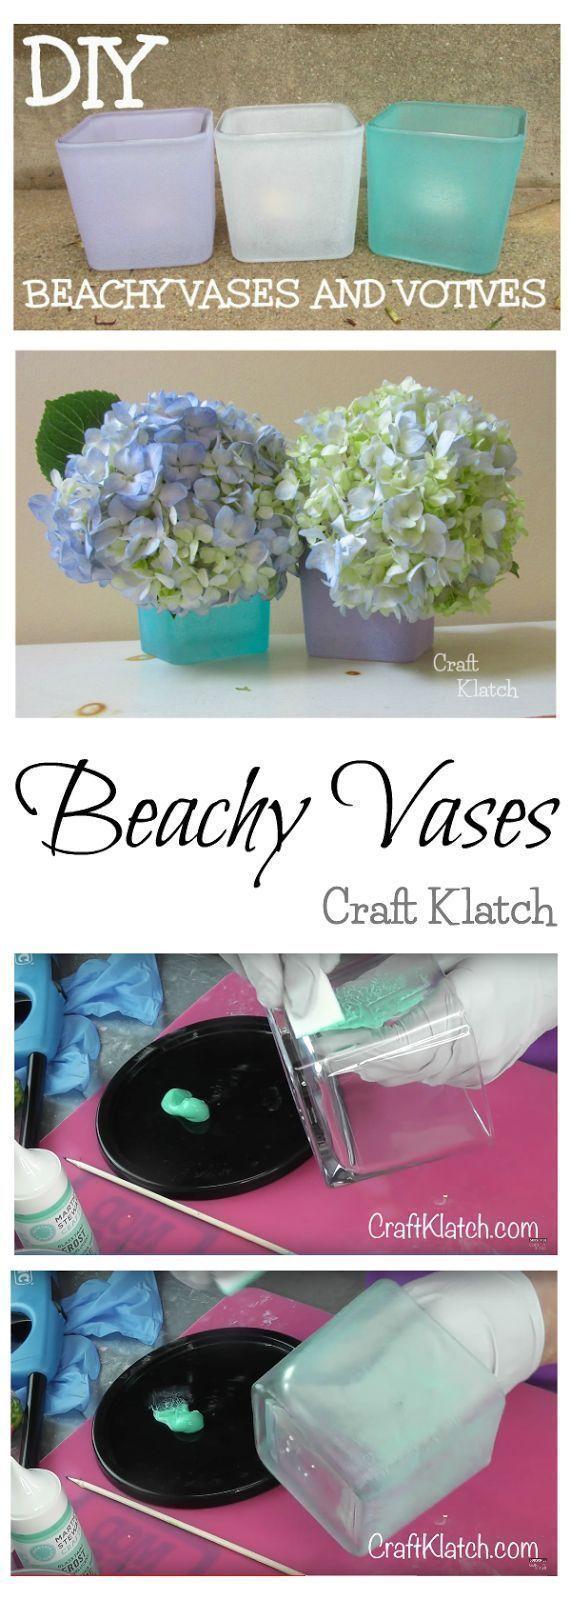 DIY Beachy Vases and Votives!!! beach, beach craft, beach glass, beachy, candleholder, craft, craft ideas, crafting, crafts, diy, glass paint, hack, how to, idea, ideas, martha stewart, sea glass, summer, vase, votive